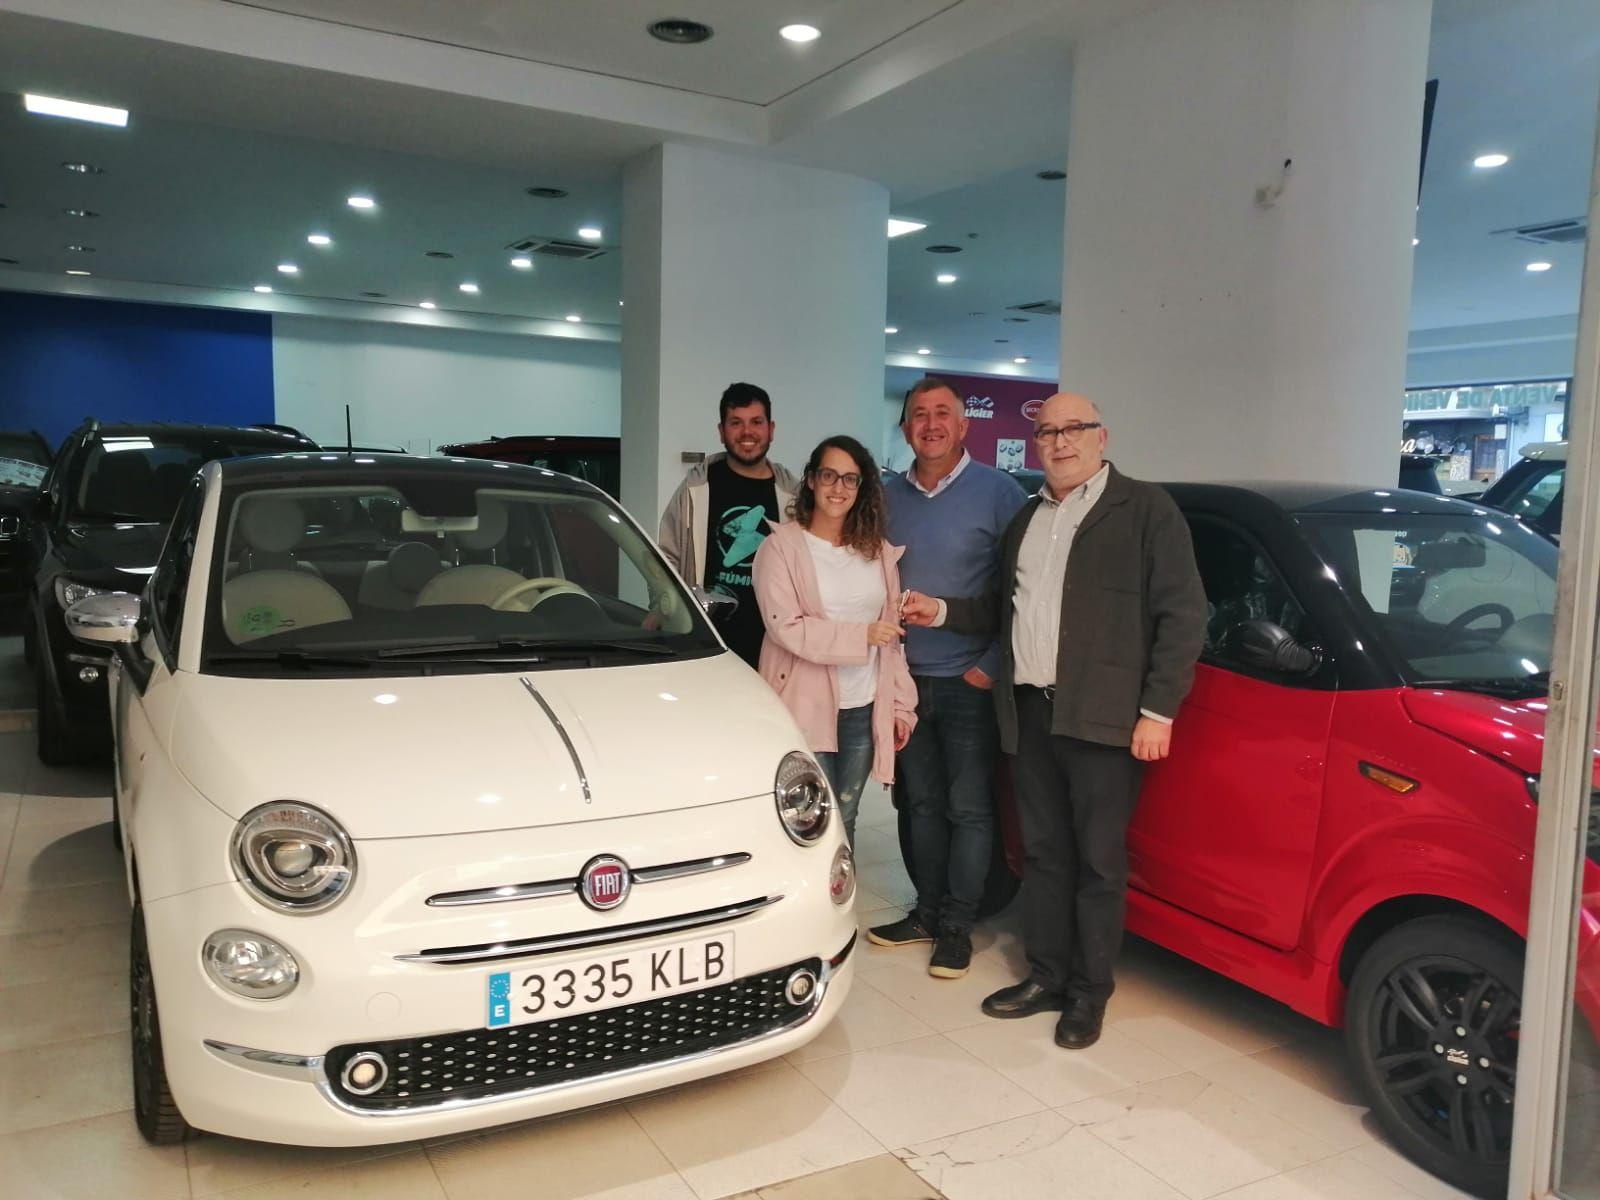 Milautomóviles entrega un Fiat 500 a la familia Pérez.